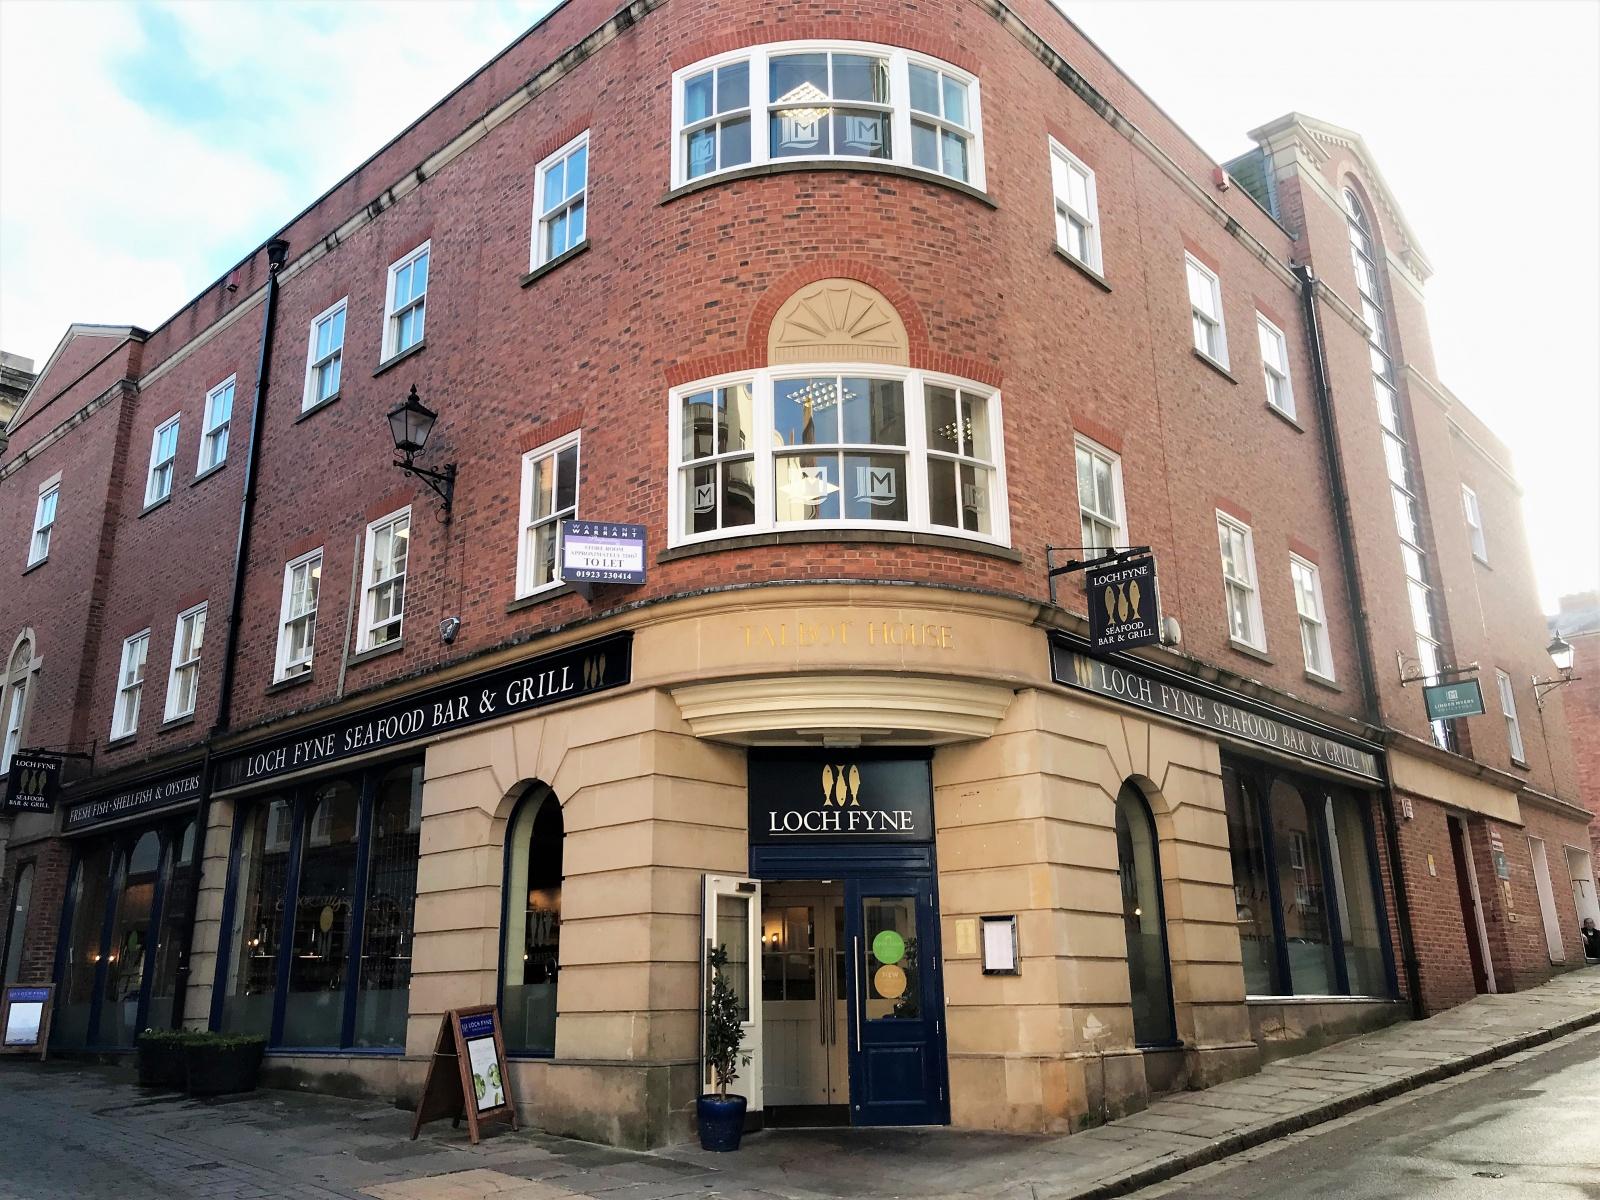 Unit 1 Talbot House (former Loch Fyne), Market Street, Shrewsbury, Shropshire